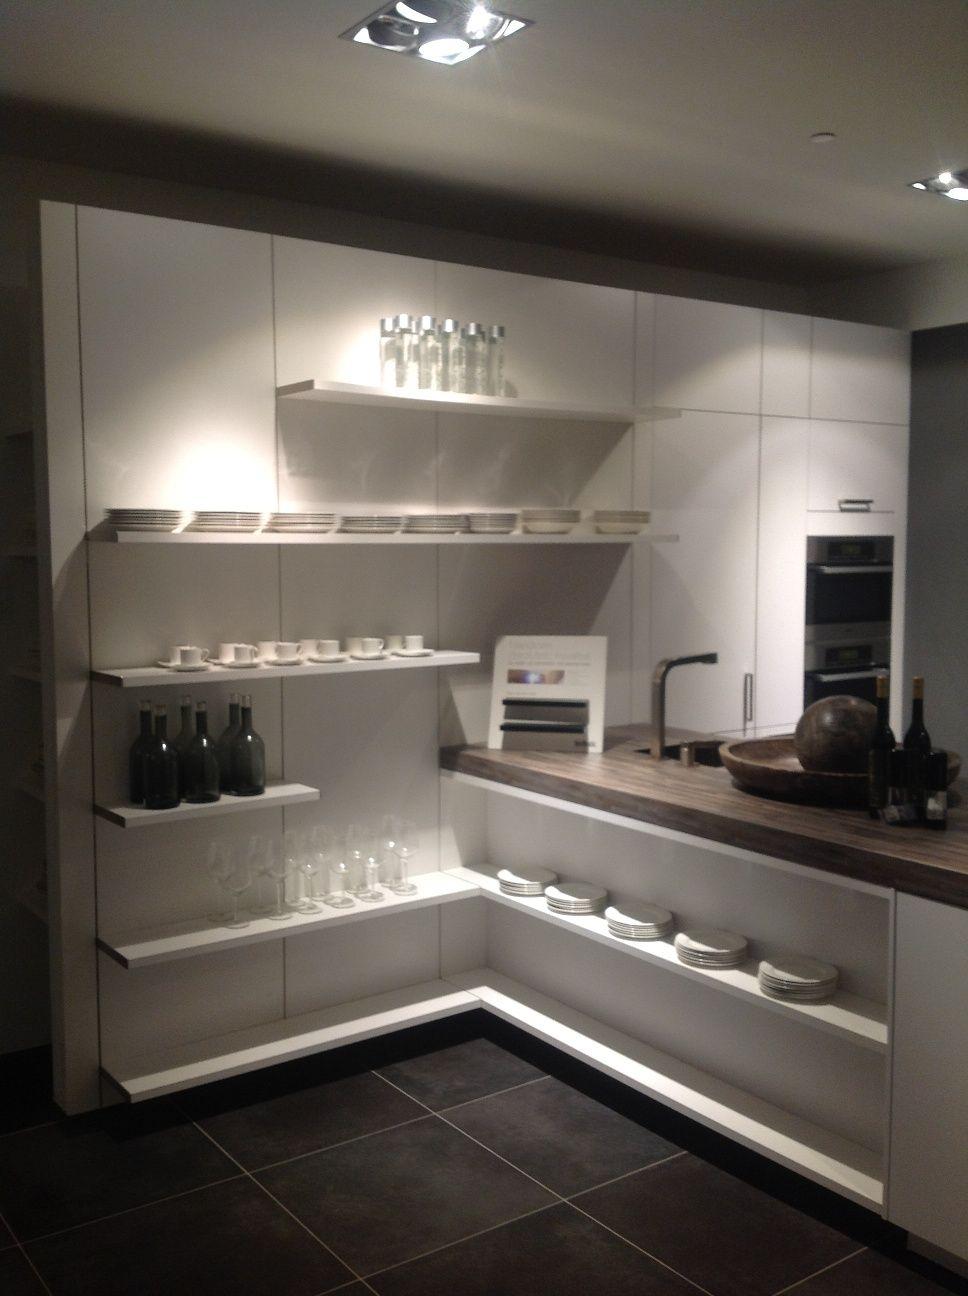 Siematic showroomkeukens siematic showroomkeuken aanbiedingen siematic hightech - Modele en ingerichte keuken ...